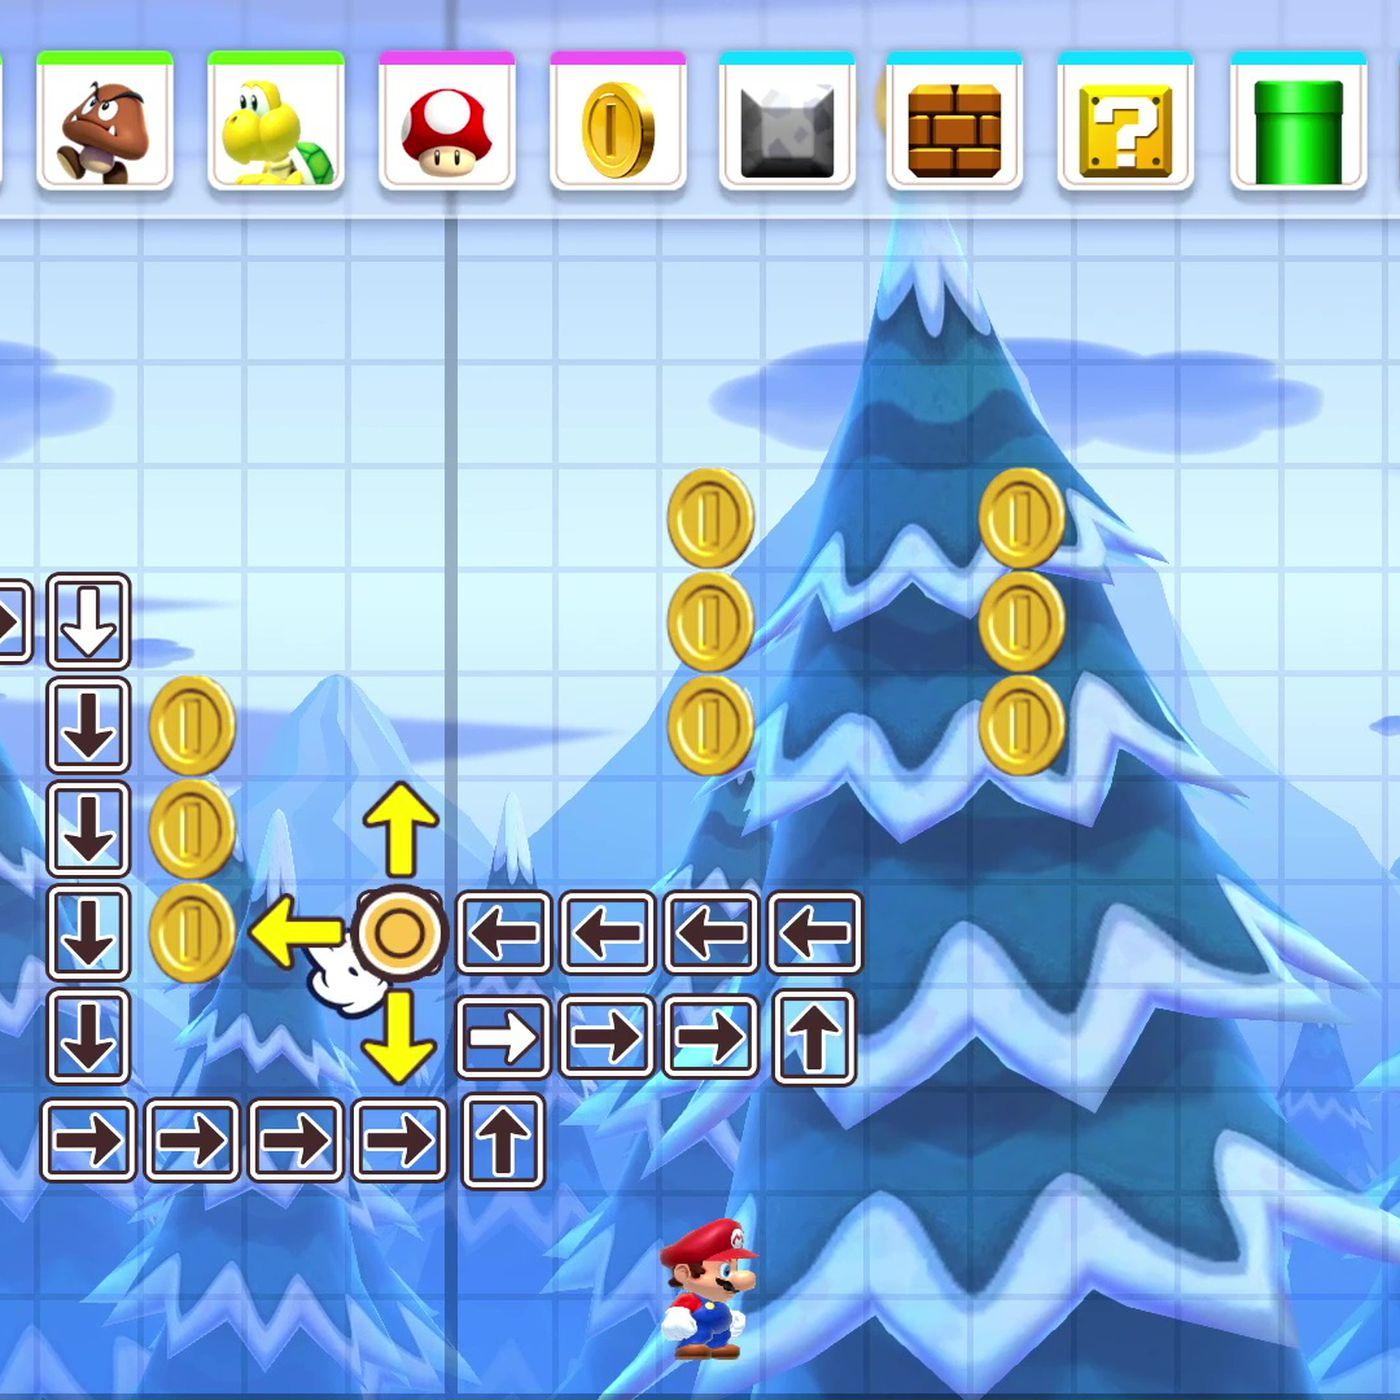 Super Mario Maker 2 comes to Nintendo Switch in June - Polygon